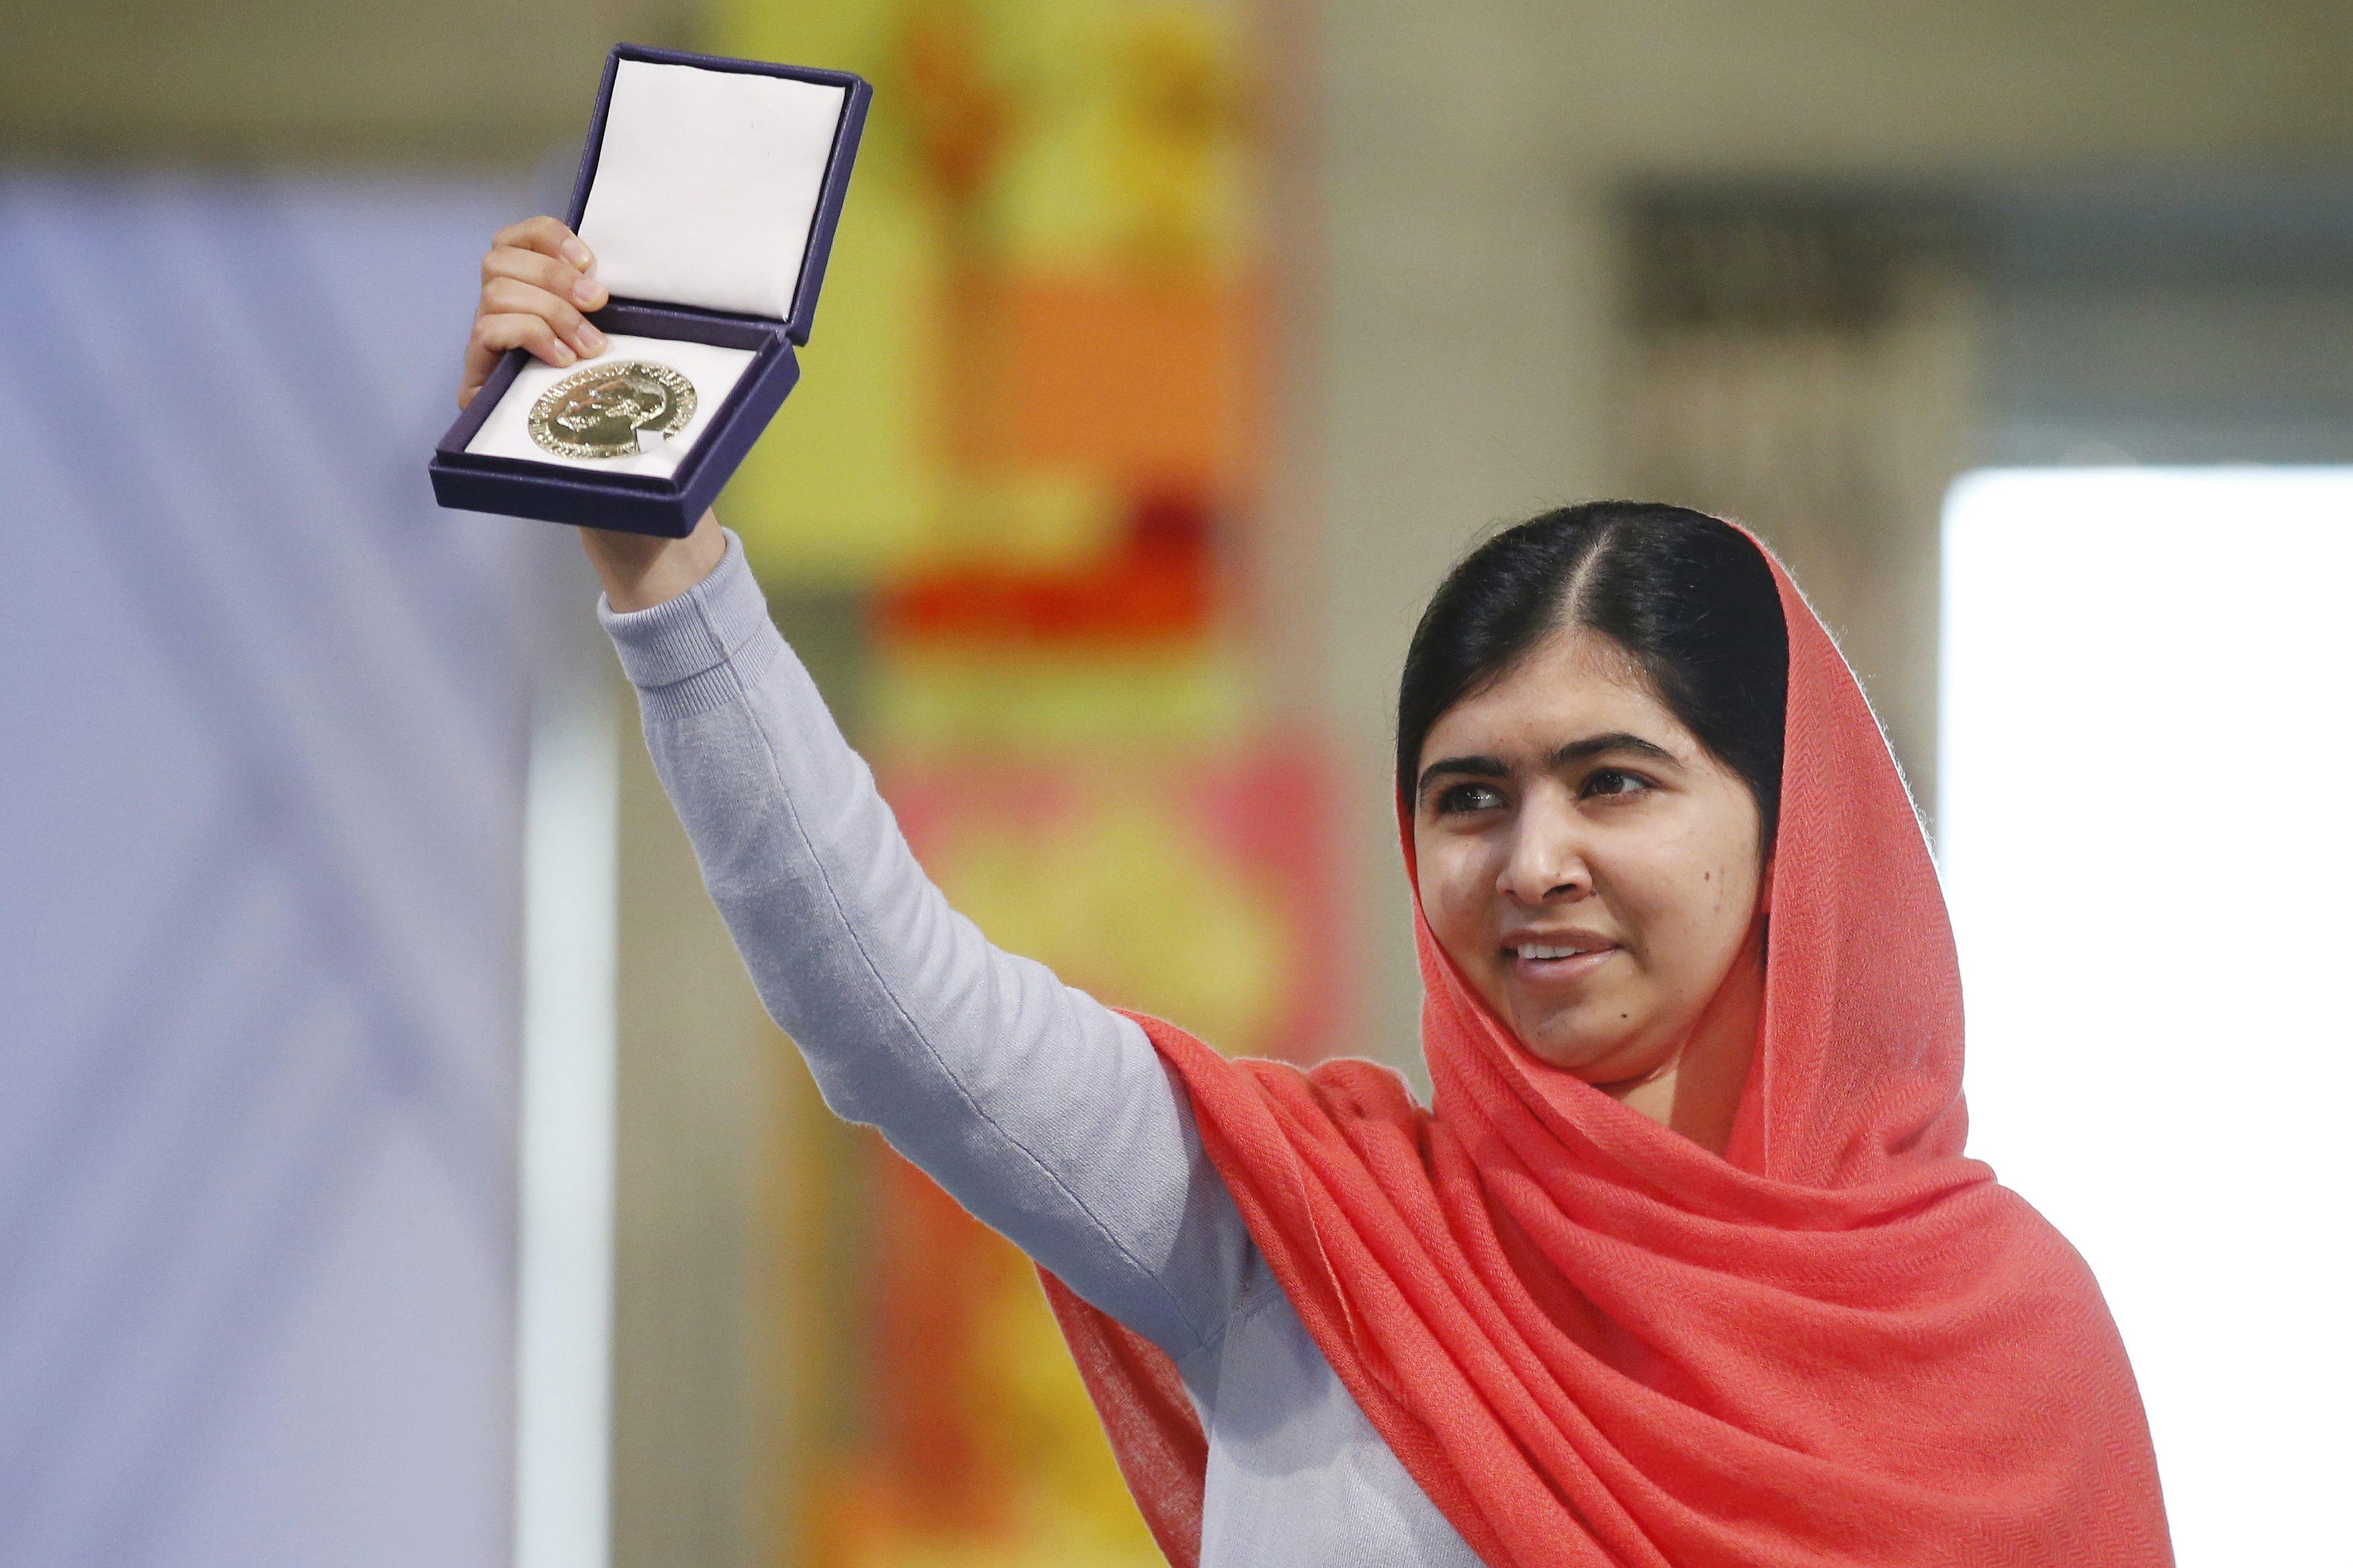 This image shows Malala Yousafzai holding the Nobel Peace Prize.